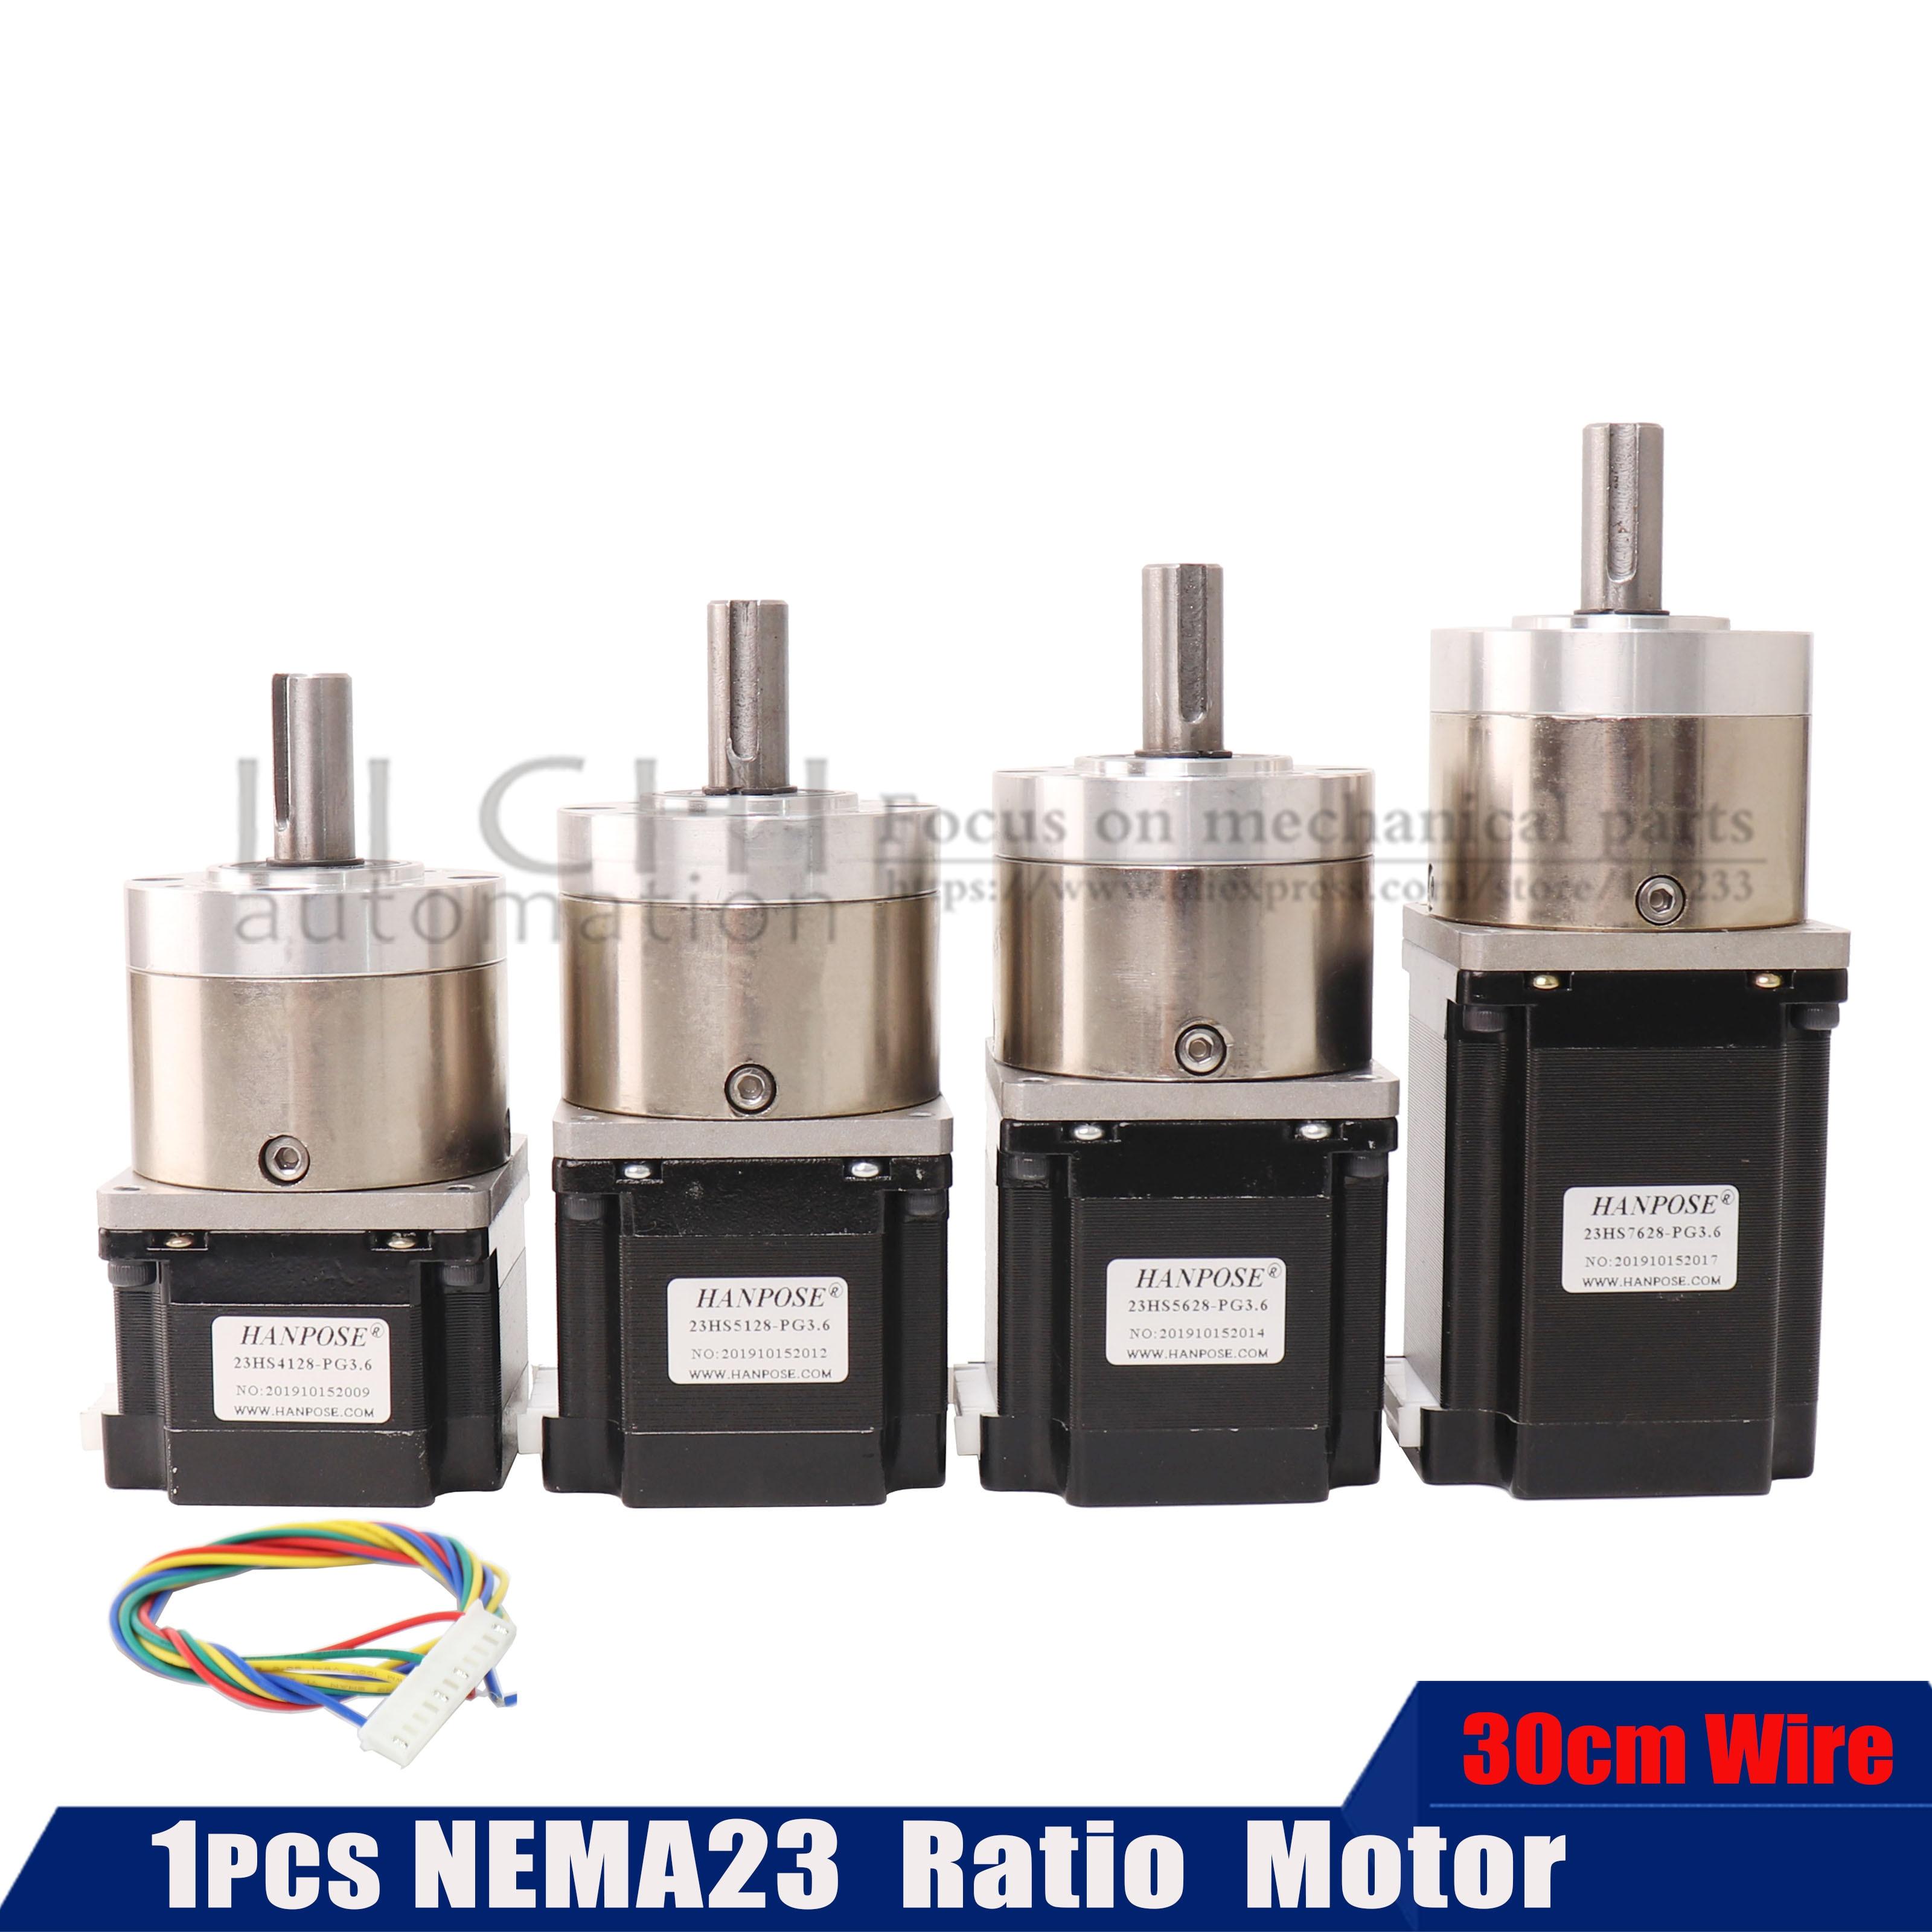 neam23 57 Step Moto Extruder Gear 23hs5628 7628 4128 Stepper Motor Ratio 5.18:1 Planetary Gearbox OSM Geared For 3D Printer